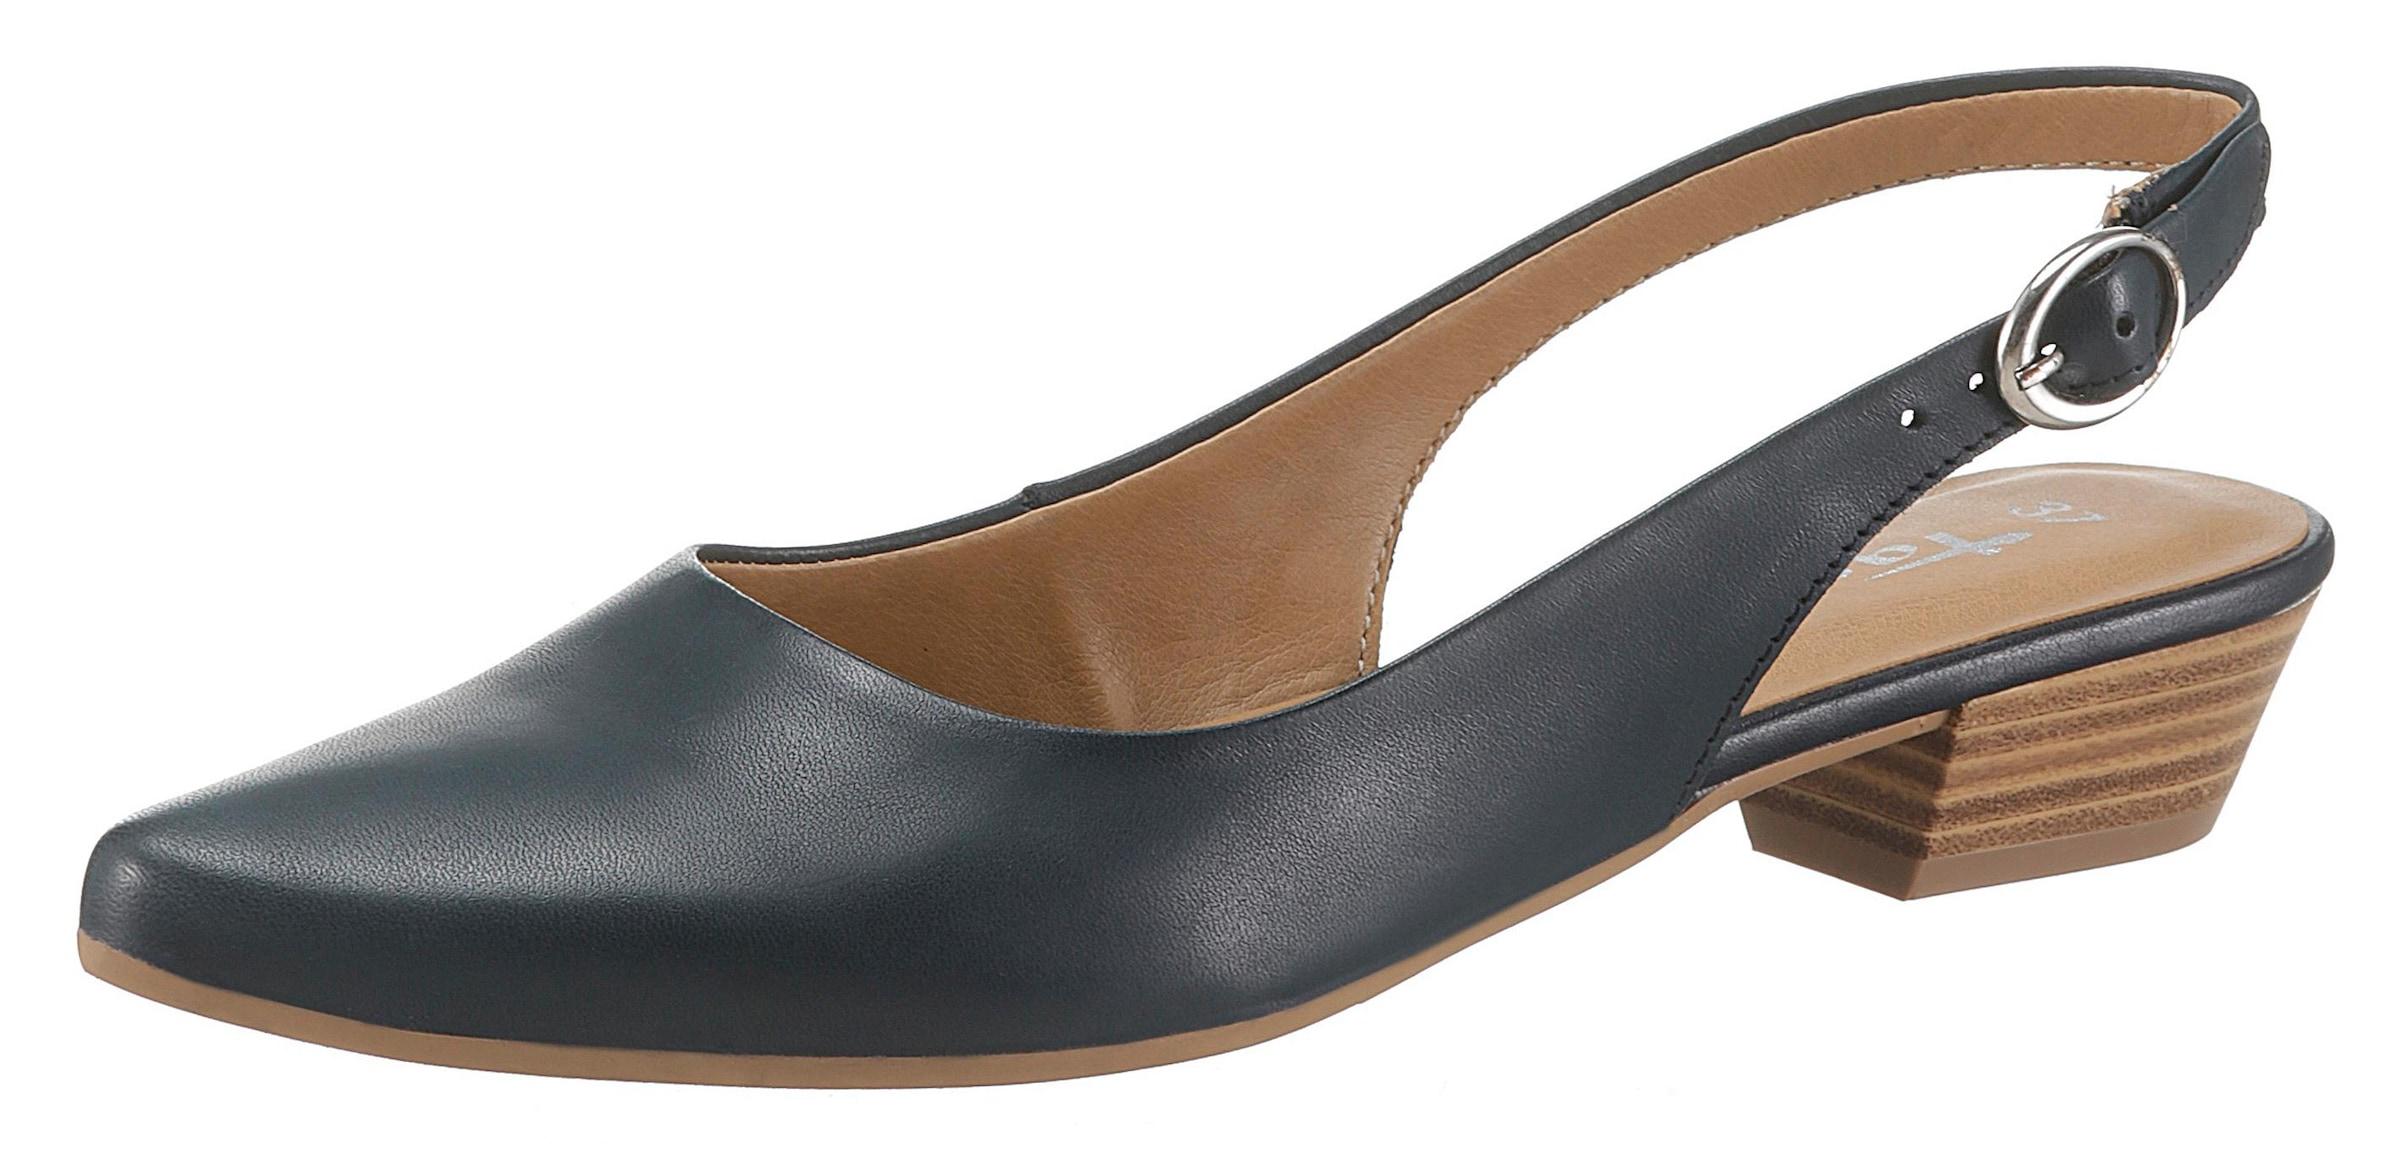 Details zu Slingpumps Tamaris Damenmode Pumps Damen Schuhe Aus Edlem Leder In Spitzer Form